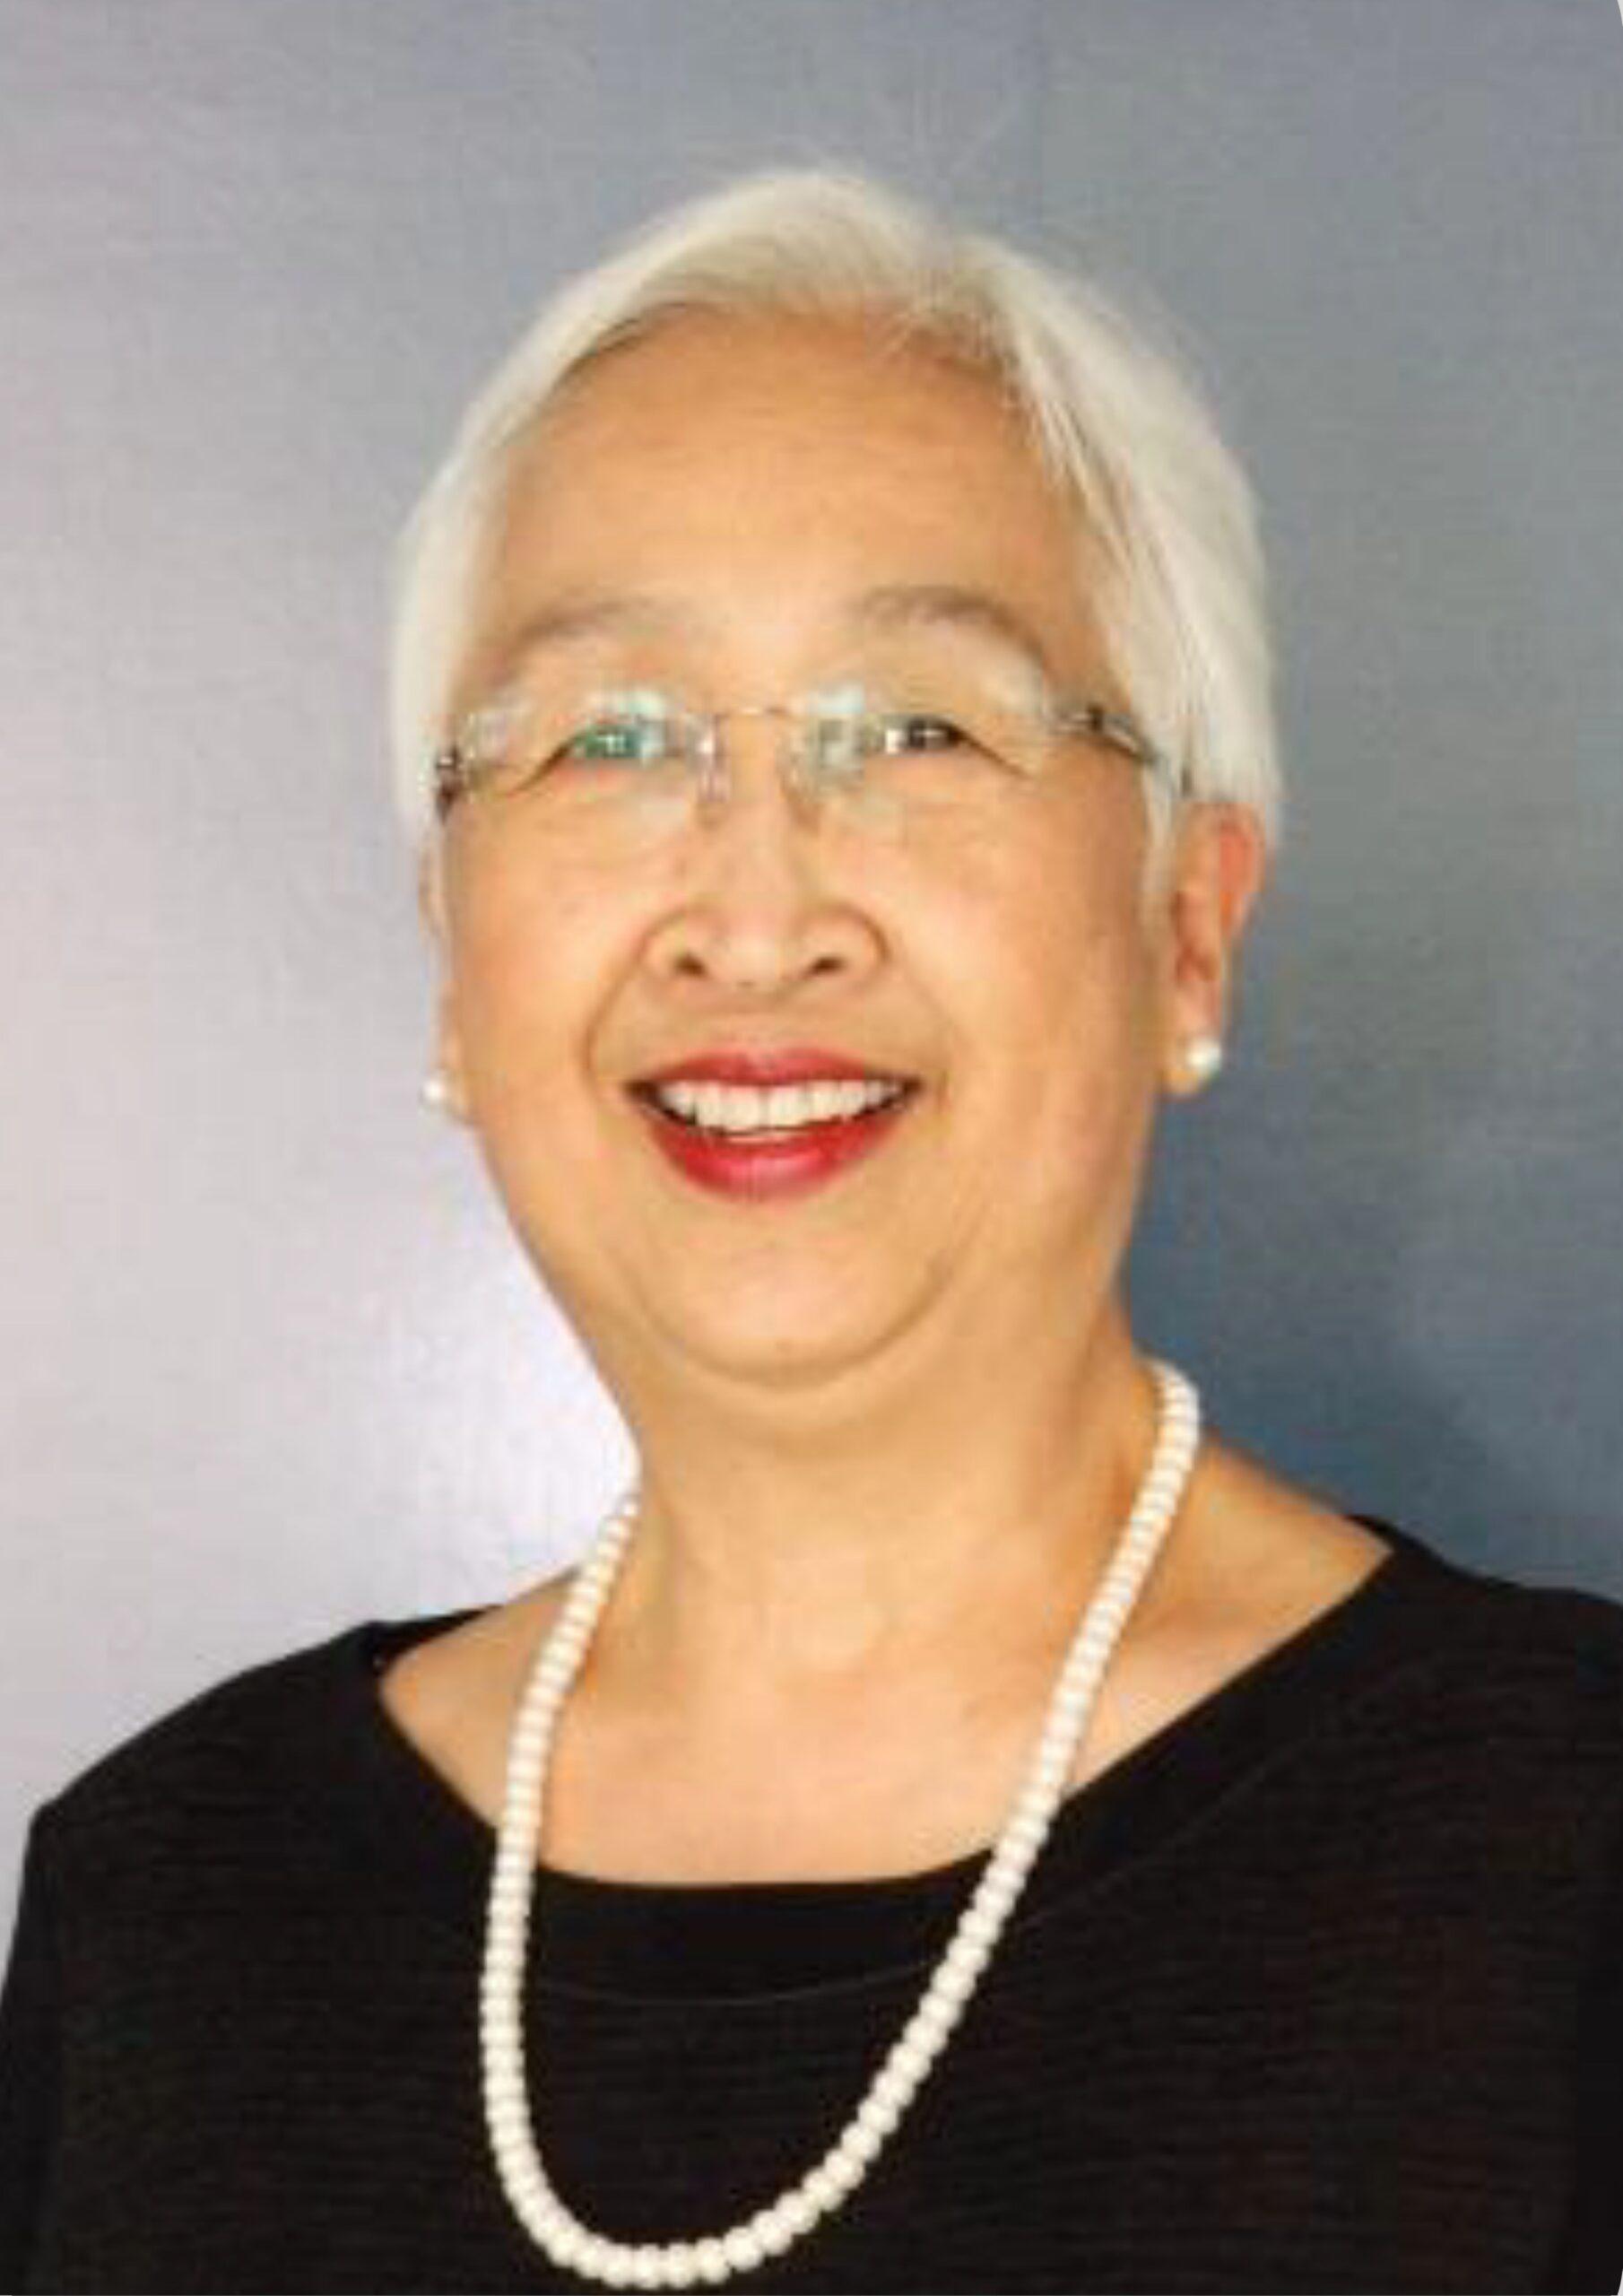 Dr. Pornpun Waitayangkoon